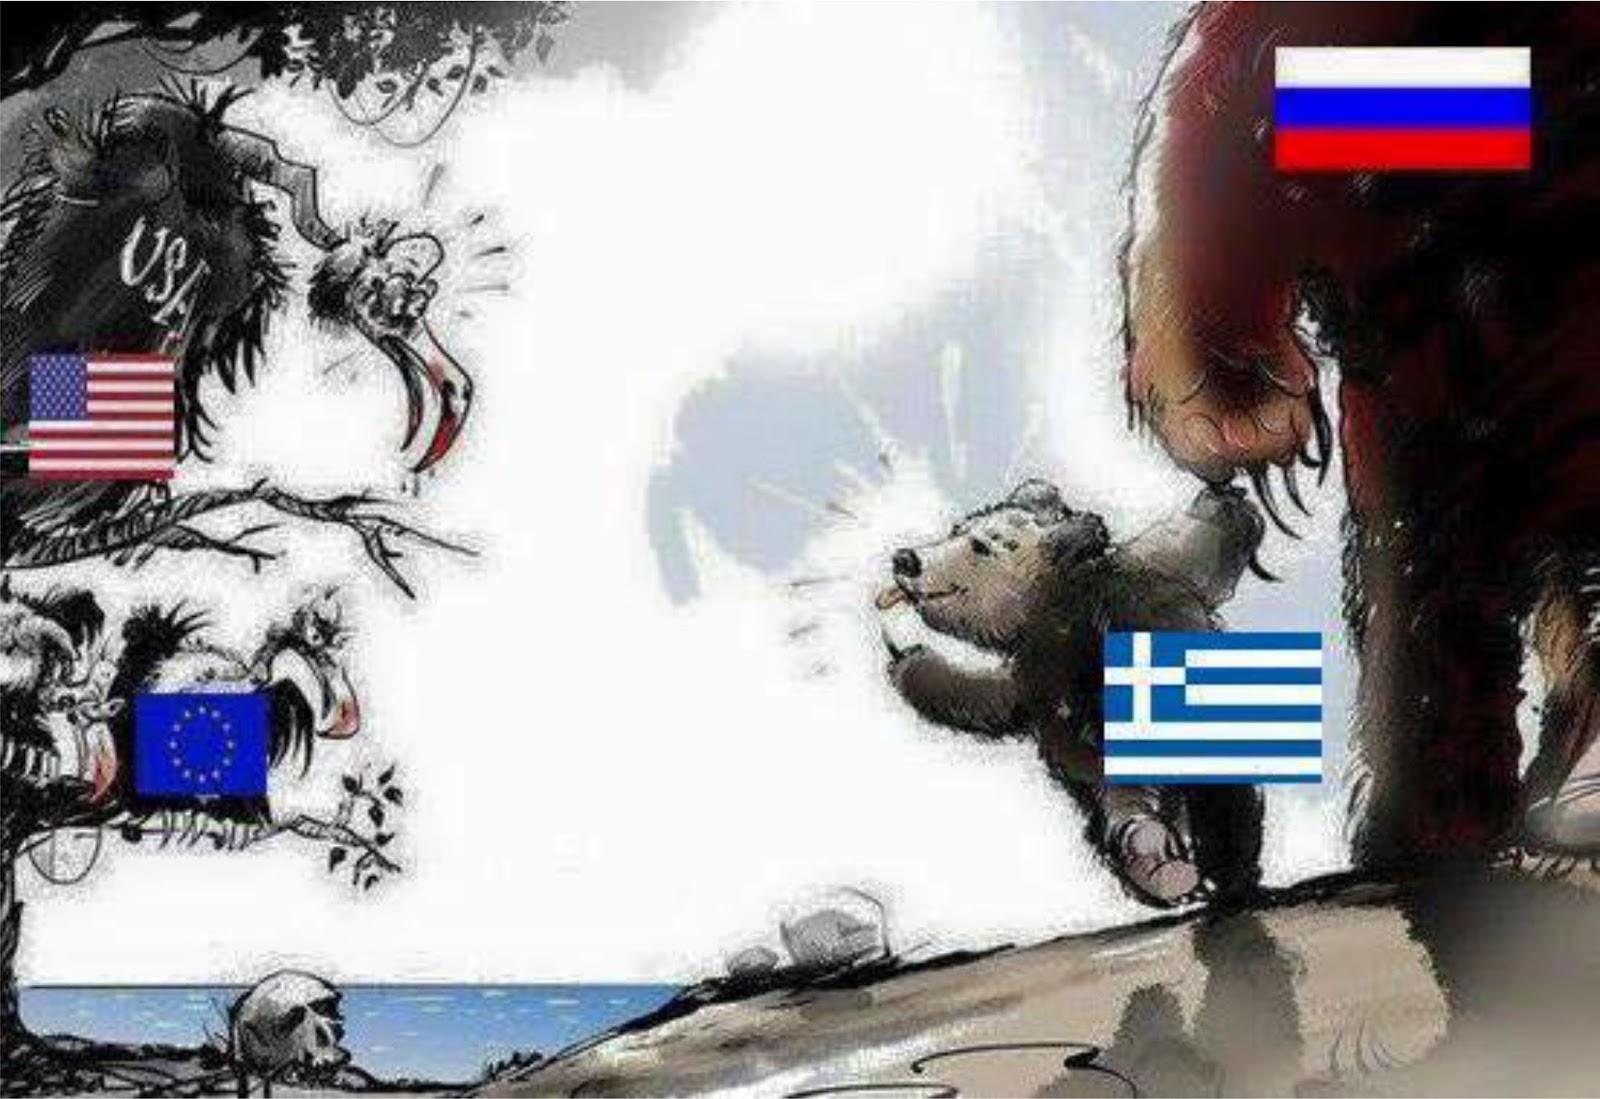 http://4.bp.blogspot.com/-3RrIDgGCvK8/VZqIsO-CxHI/AAAAAAAAHh0/MMmcH7Lzq9o/s1600/Greece%2BEU%2Breferendum.%2BGreferendum.%2BAthens%2B5th%2BJuly%2B2015.%2BNO.%2B%25CE%258C%25CE%25A7%25CE%2599.%2BCartoon.%2B%25231ab%2B%25282%2529.jpg?SSImageQuality=Full